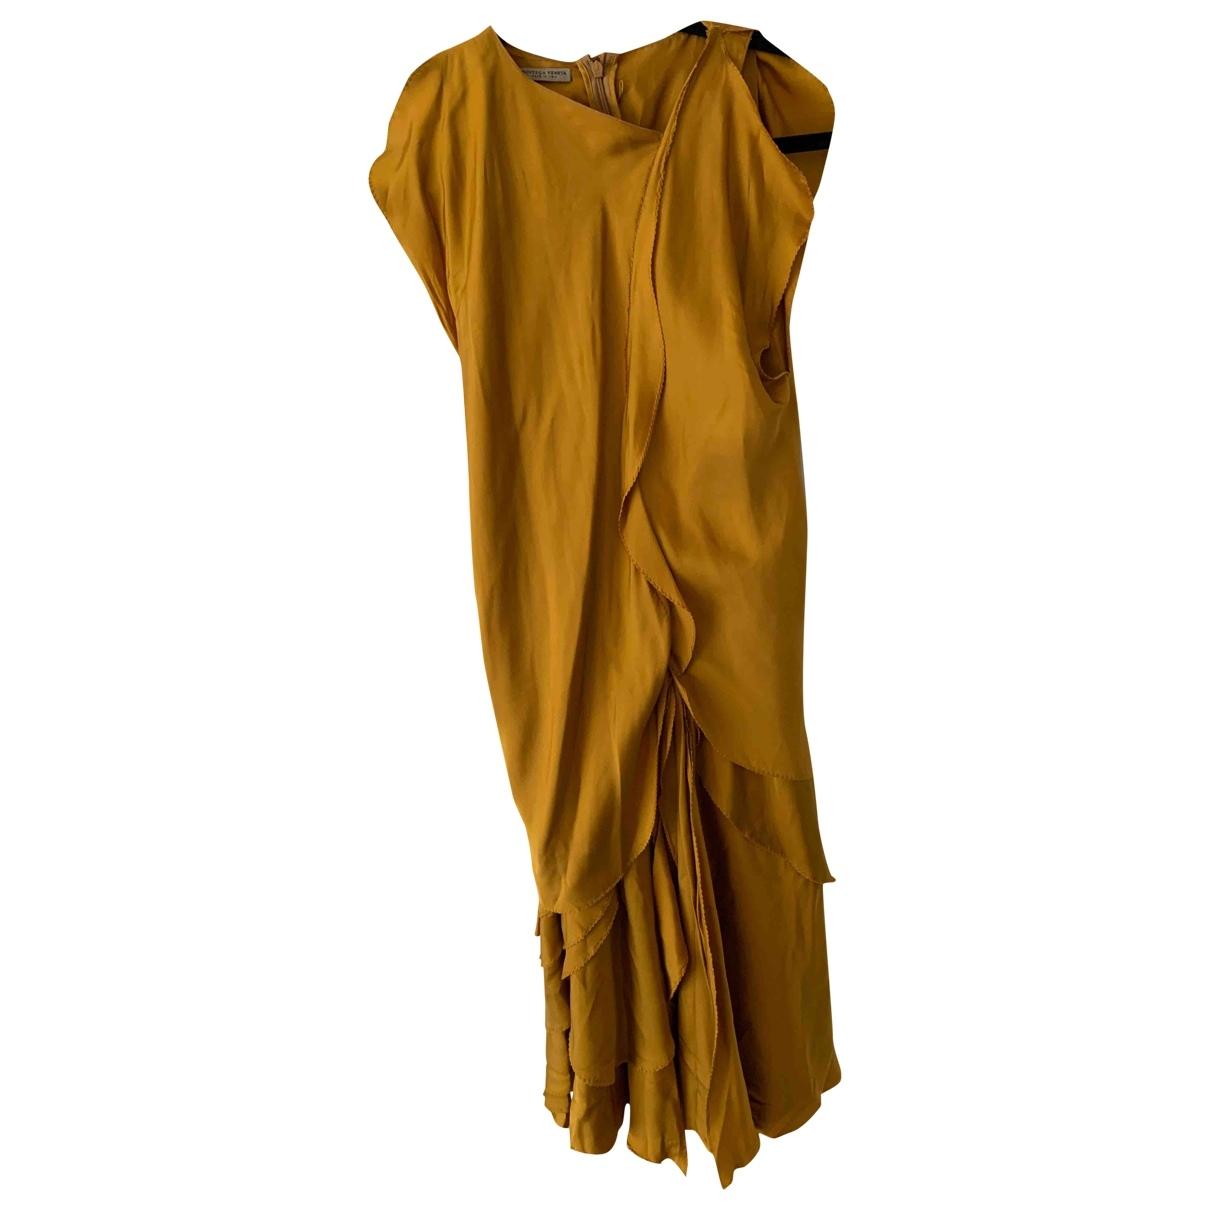 Bottega Veneta \N Yellow Silk dress for Women 38 IT